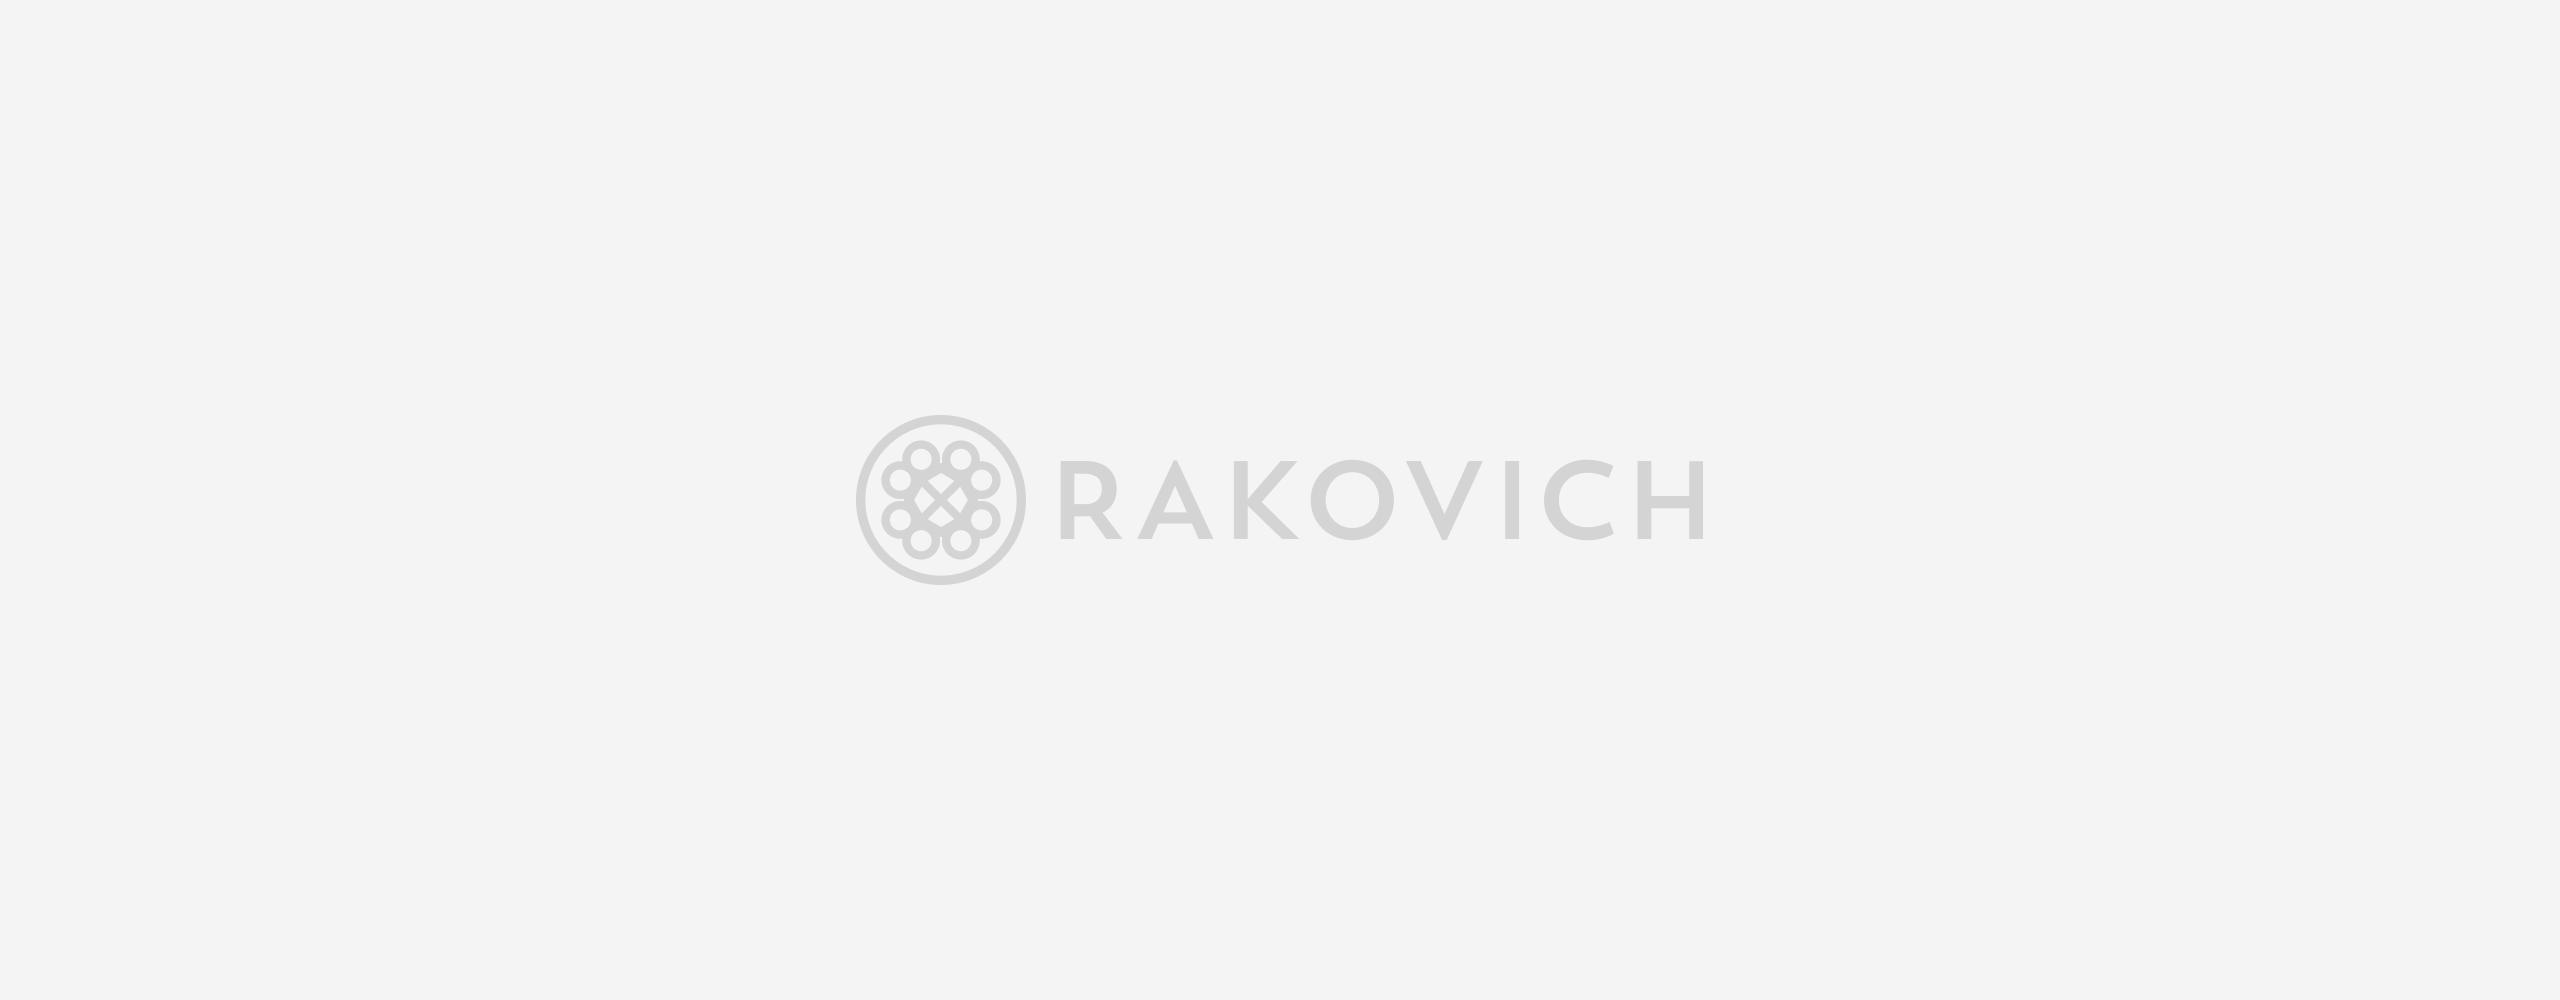 Rakovich logotype